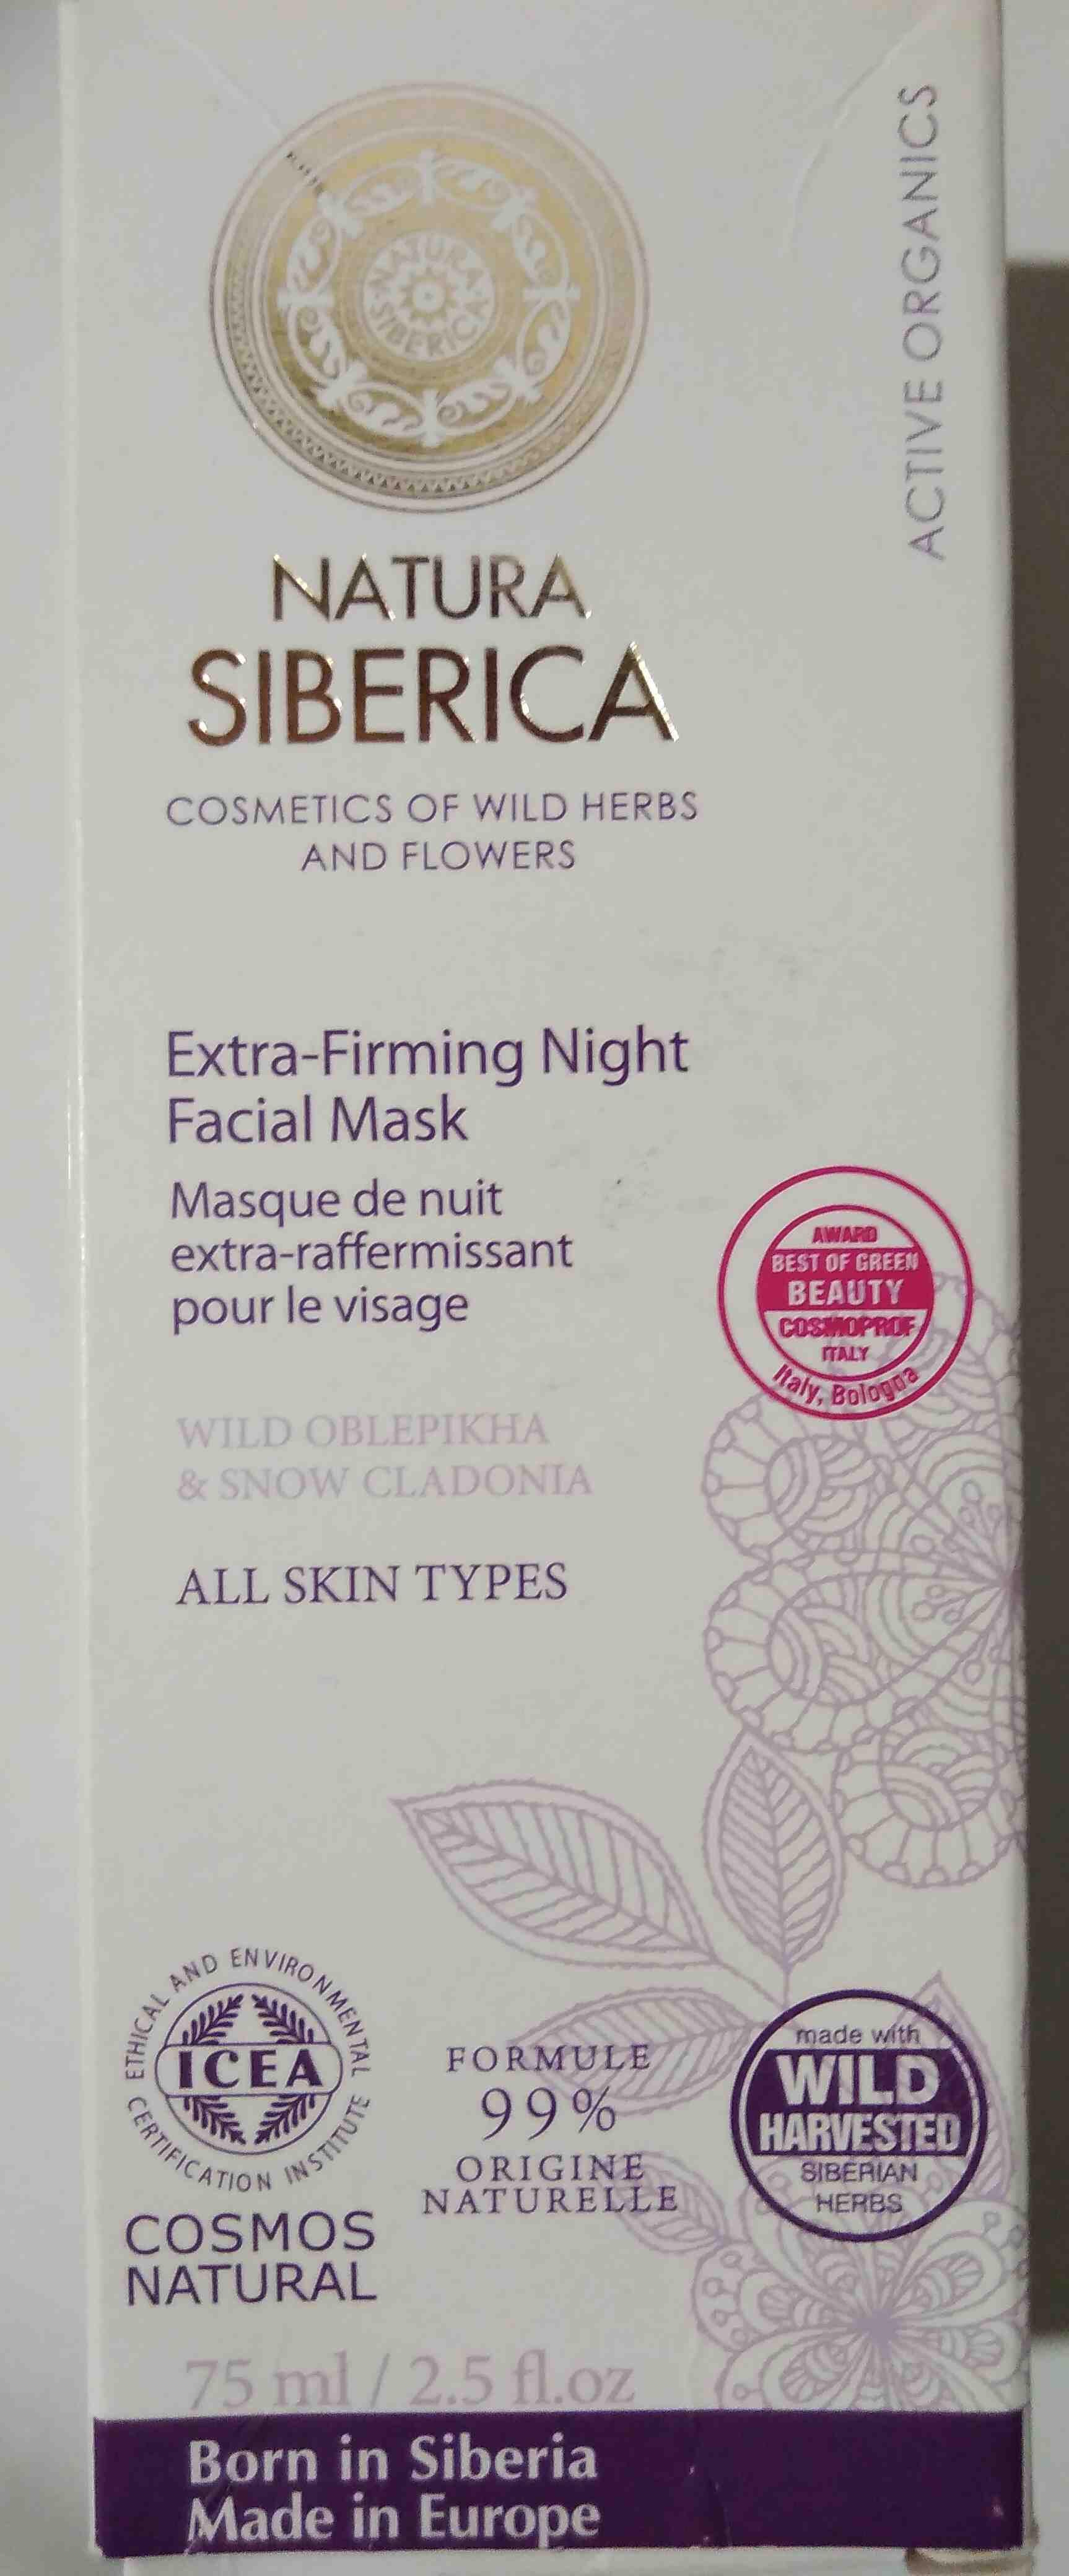 extra firming night facial mask - Product - en